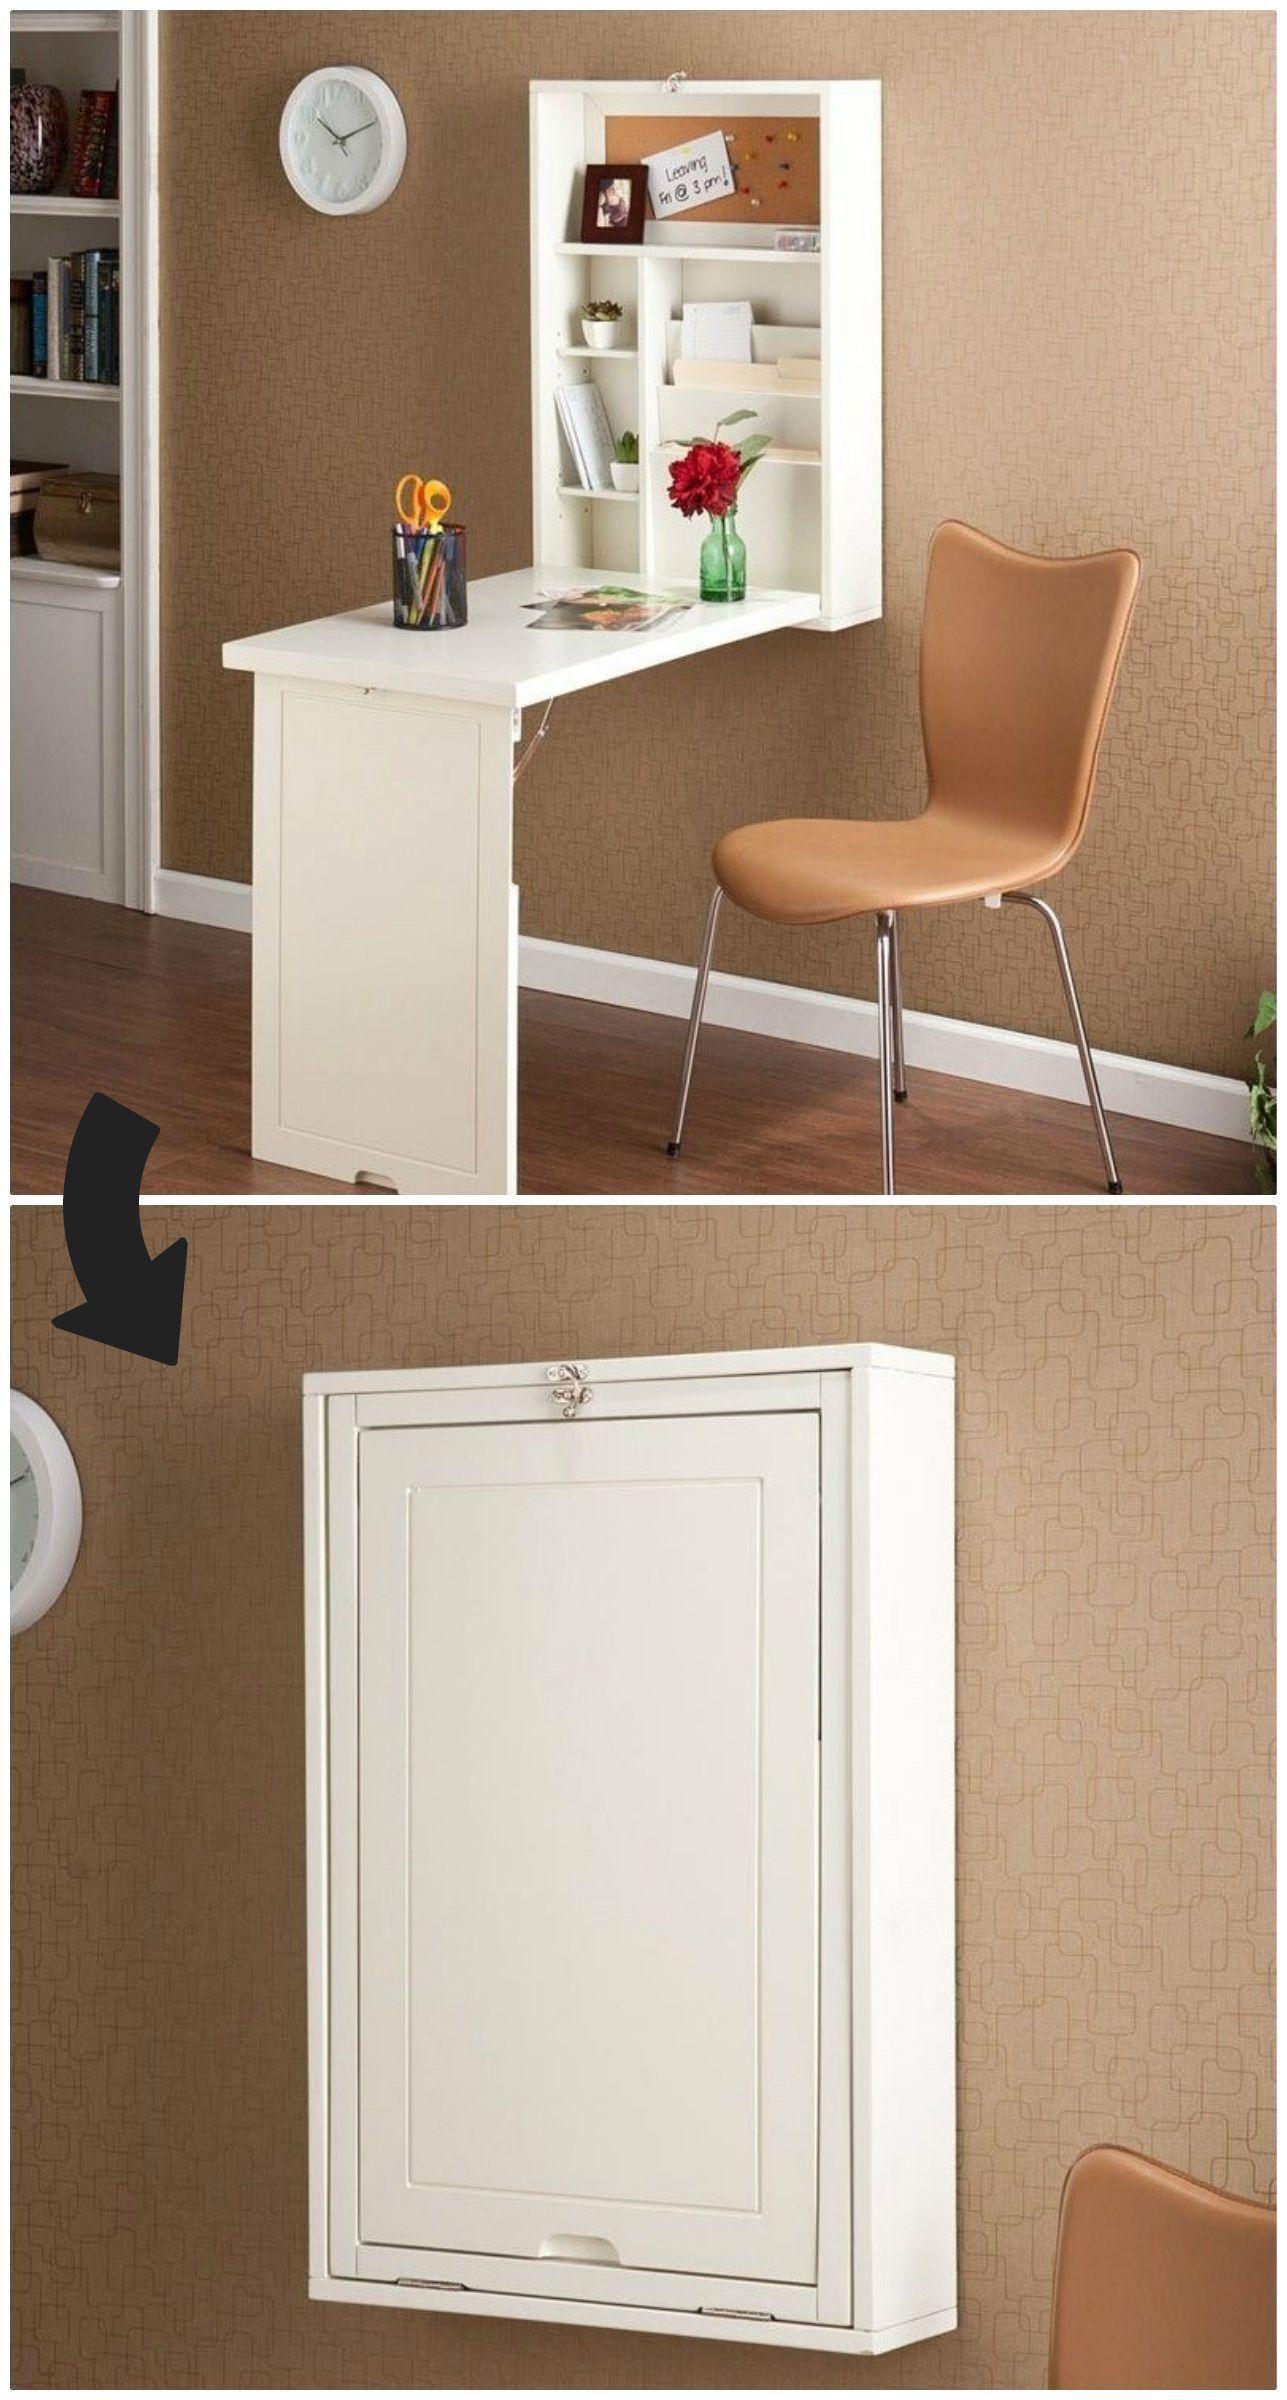 Ten space-saving desks that work great in small living spaces #smallfurniture #spacesavingfurniture